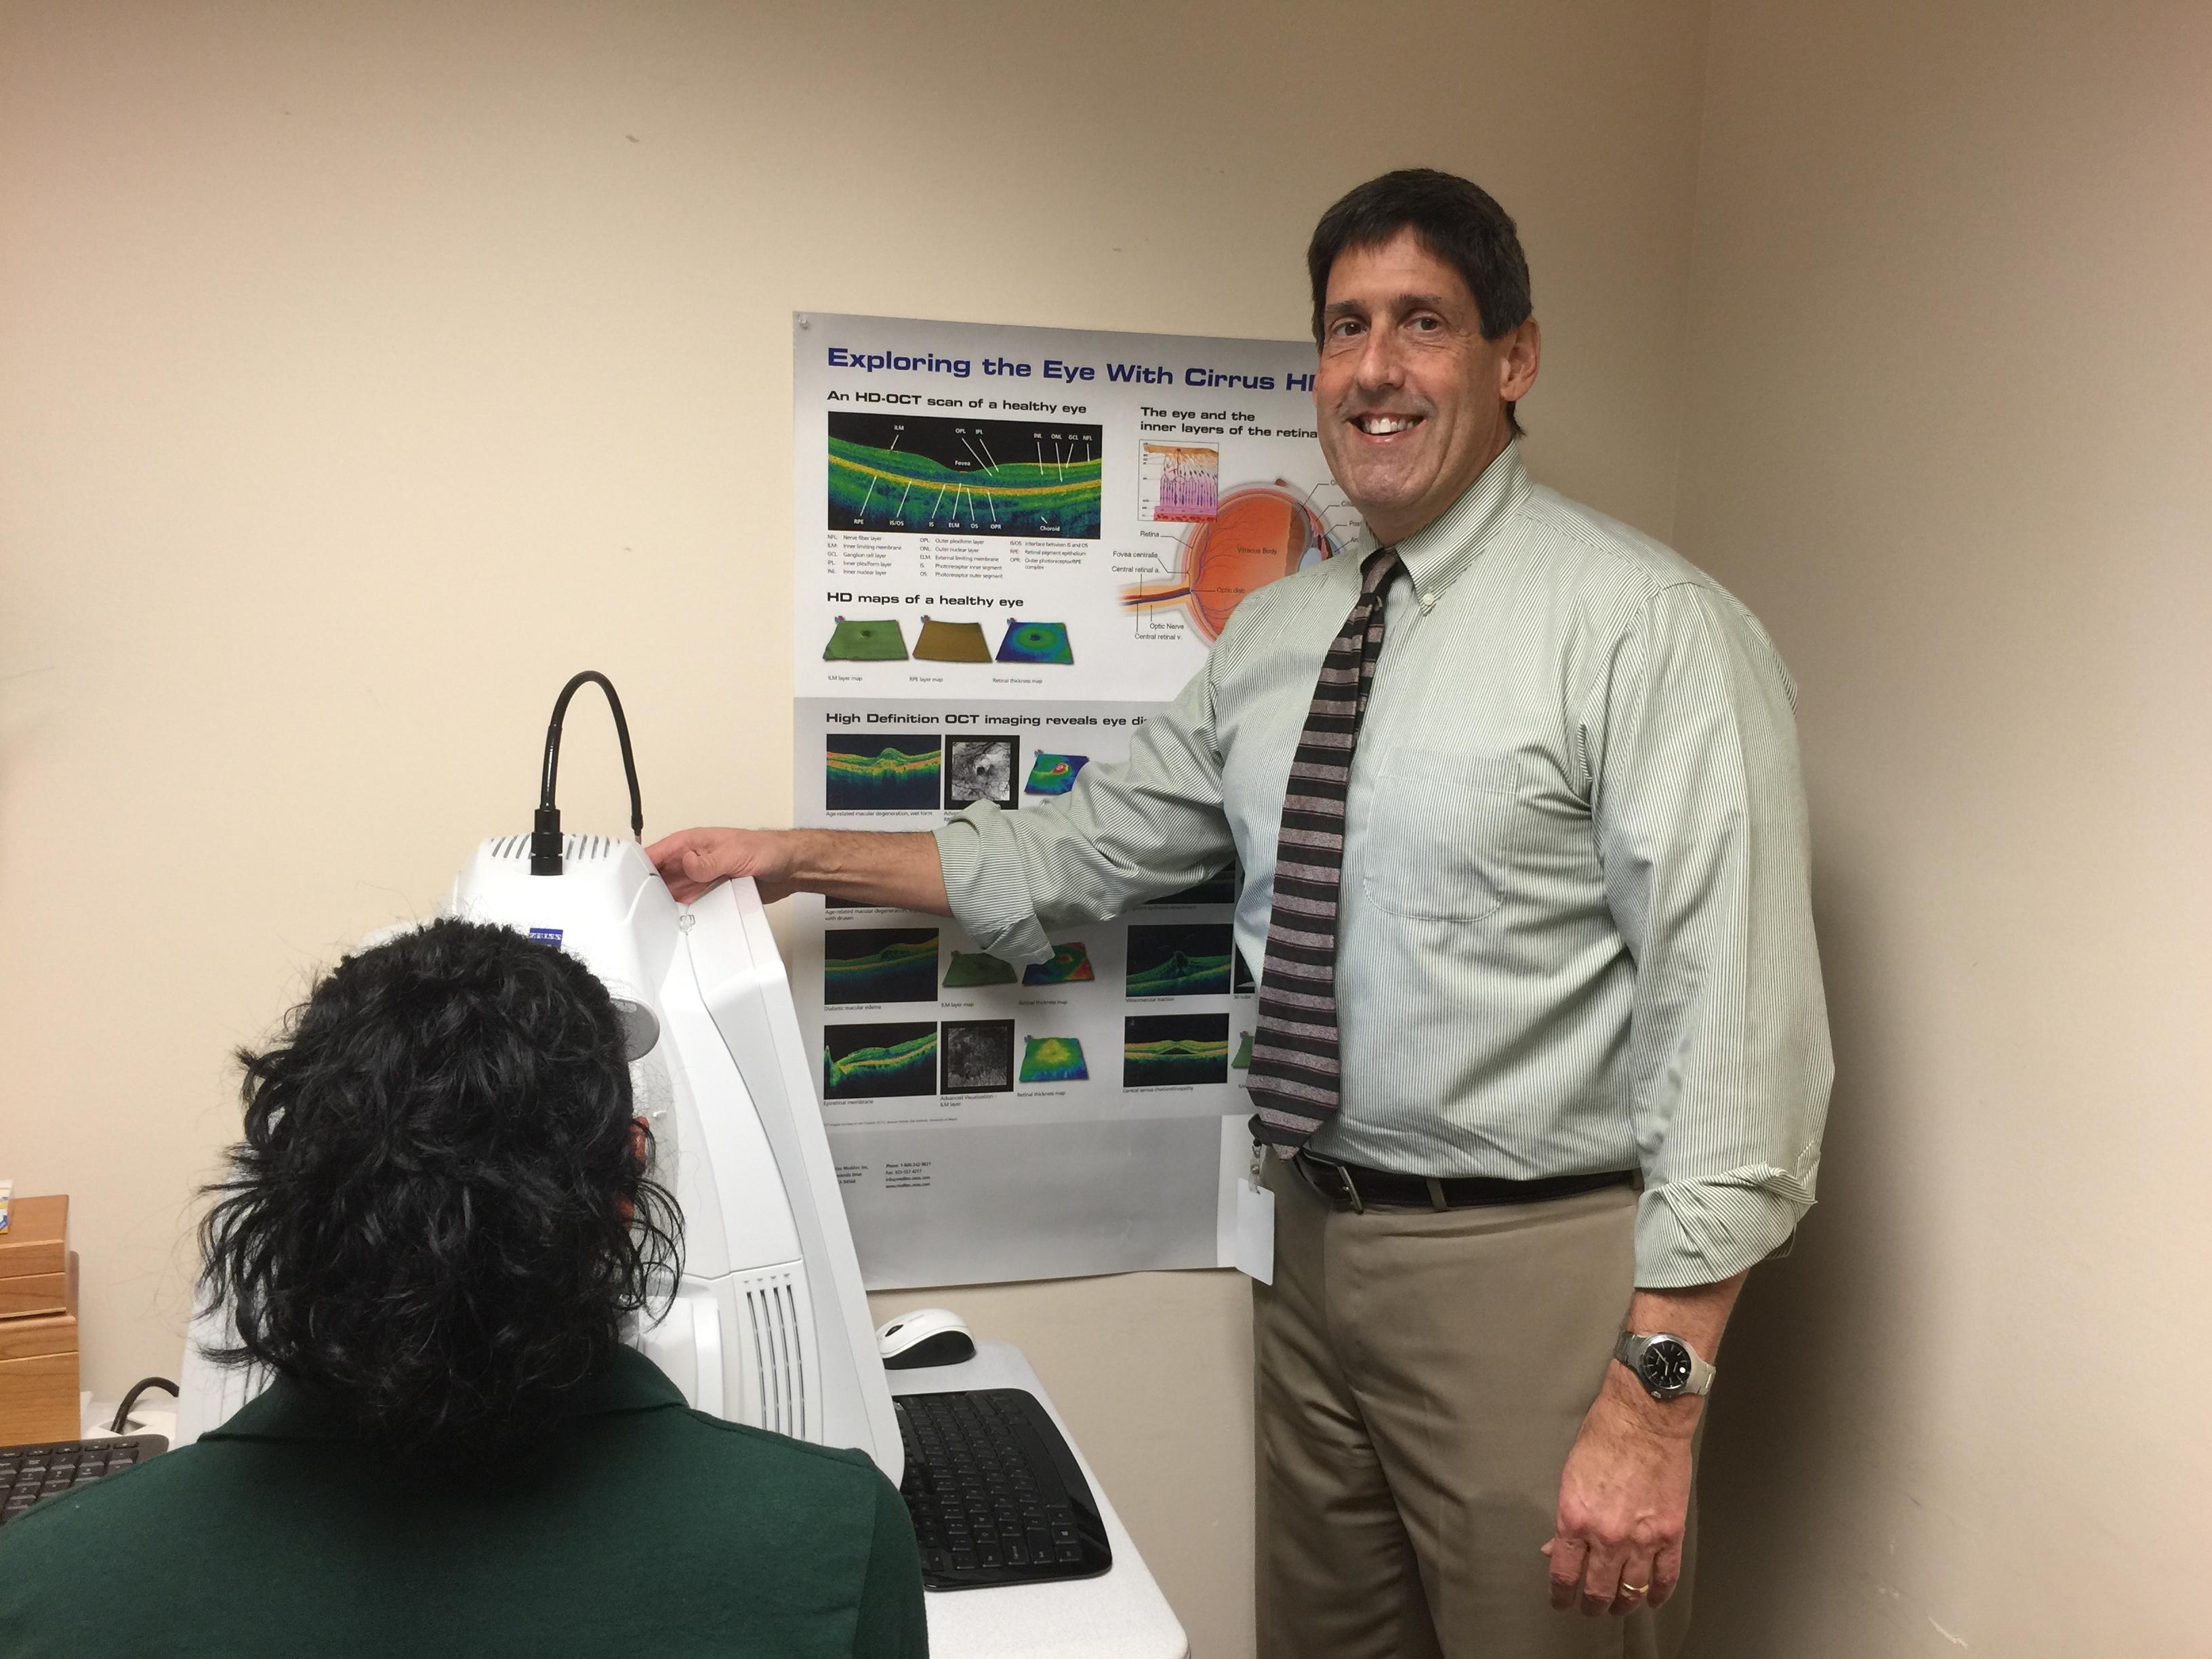 dr alan mendelsohn, fort lauderdale, south florida ophthalmologist